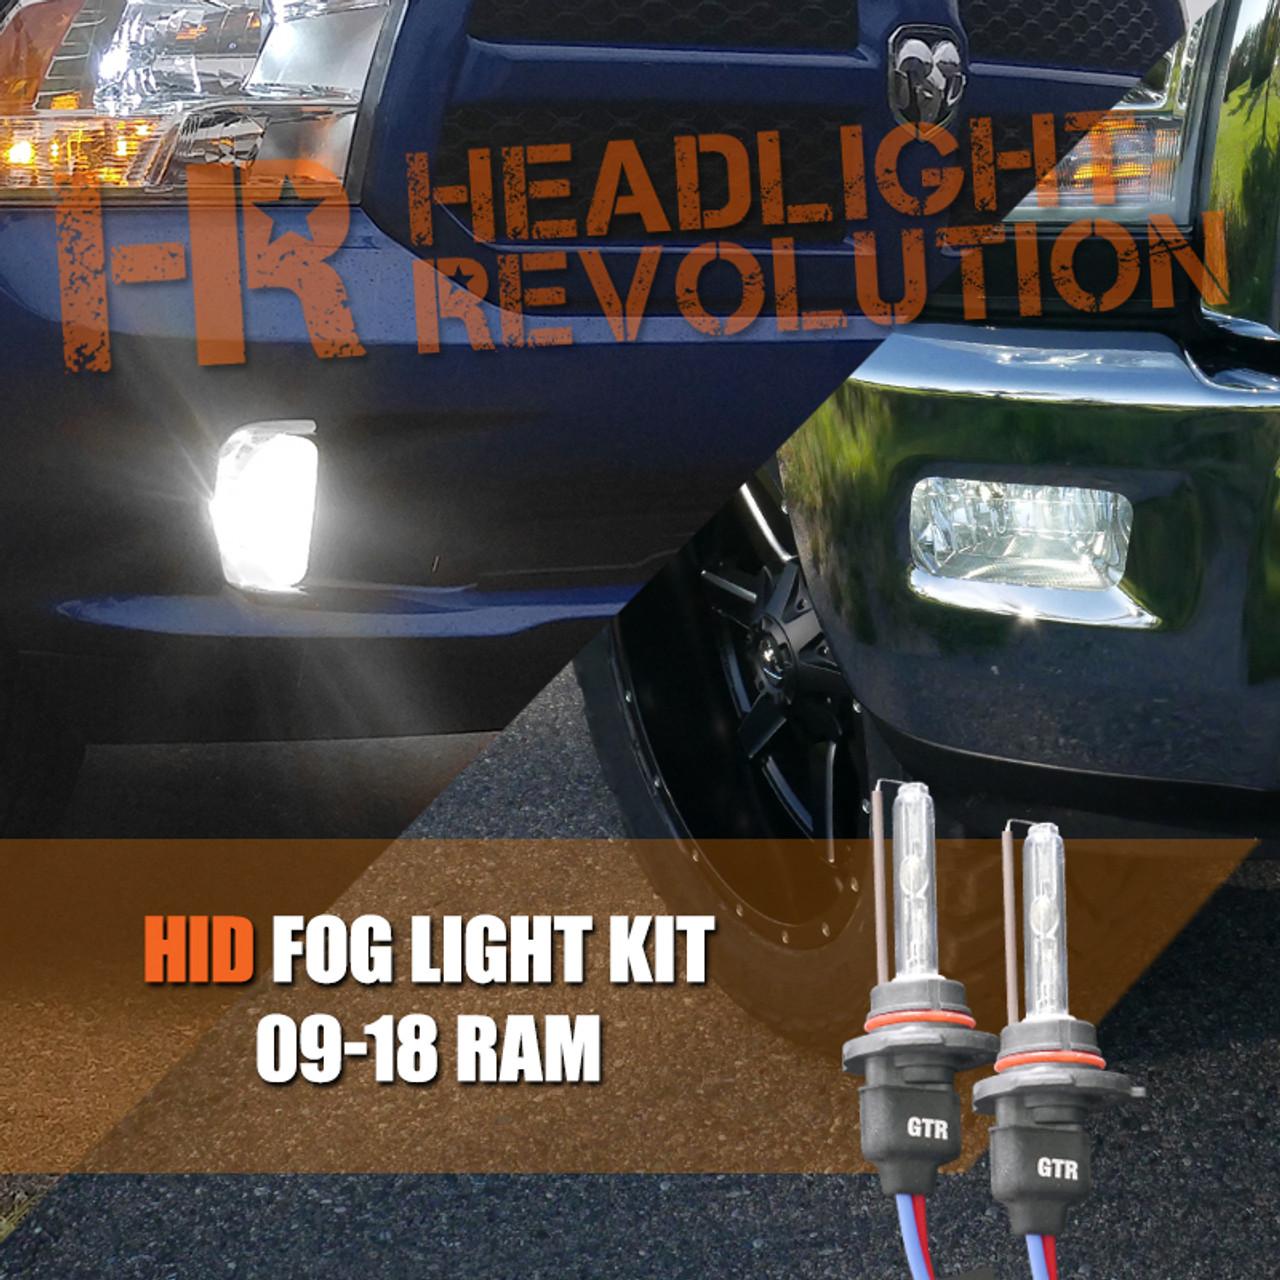 2009 - 2018 Dodge Ram Fog Light Upgrade - HID Conversion Kit